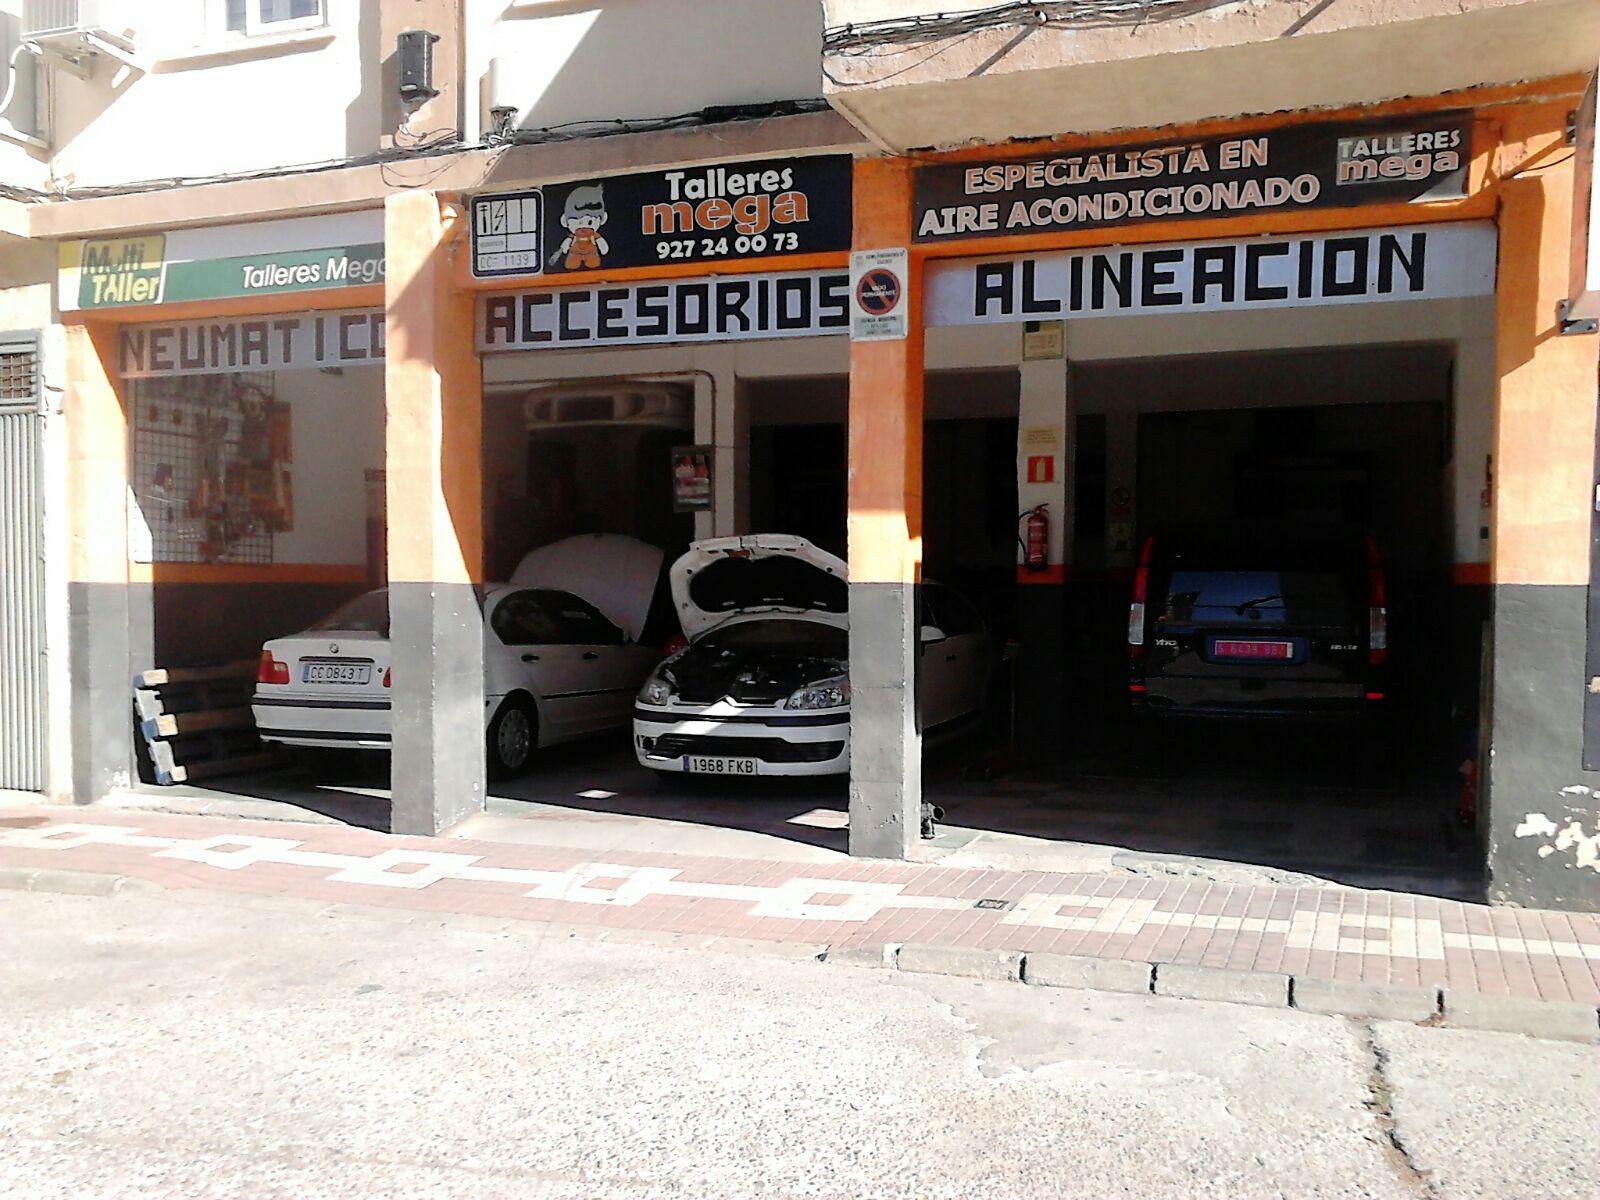 Talleres MEGA, Talleres mecanica barata en Cáceres